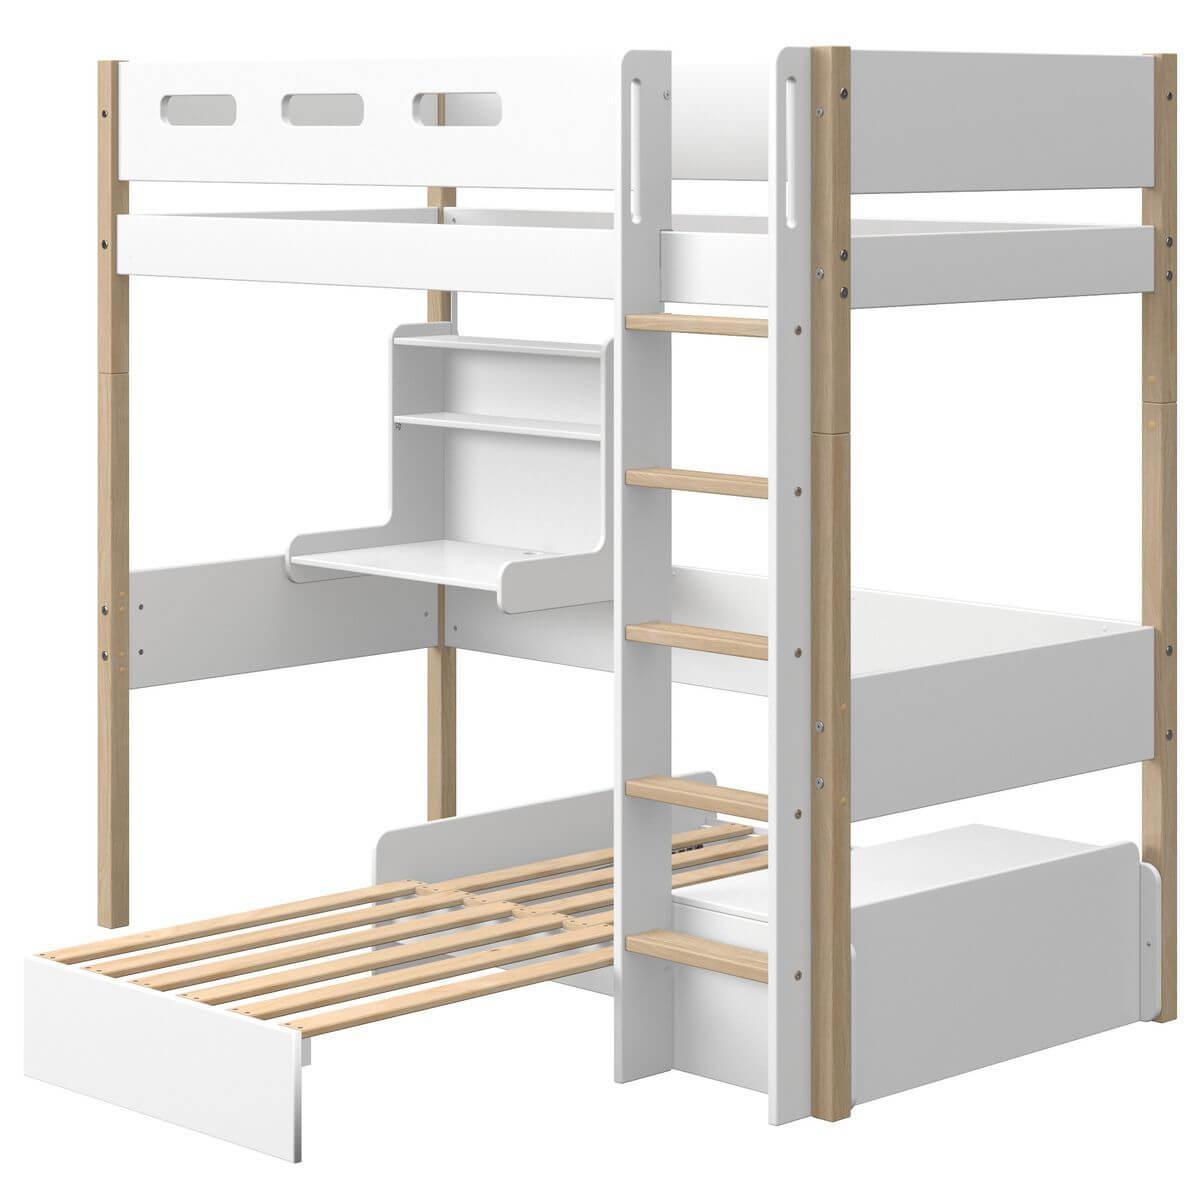 Lit mezzanine 200x90cm bureau Click-On module de couchage casa NOR Flexa chêne-blanc